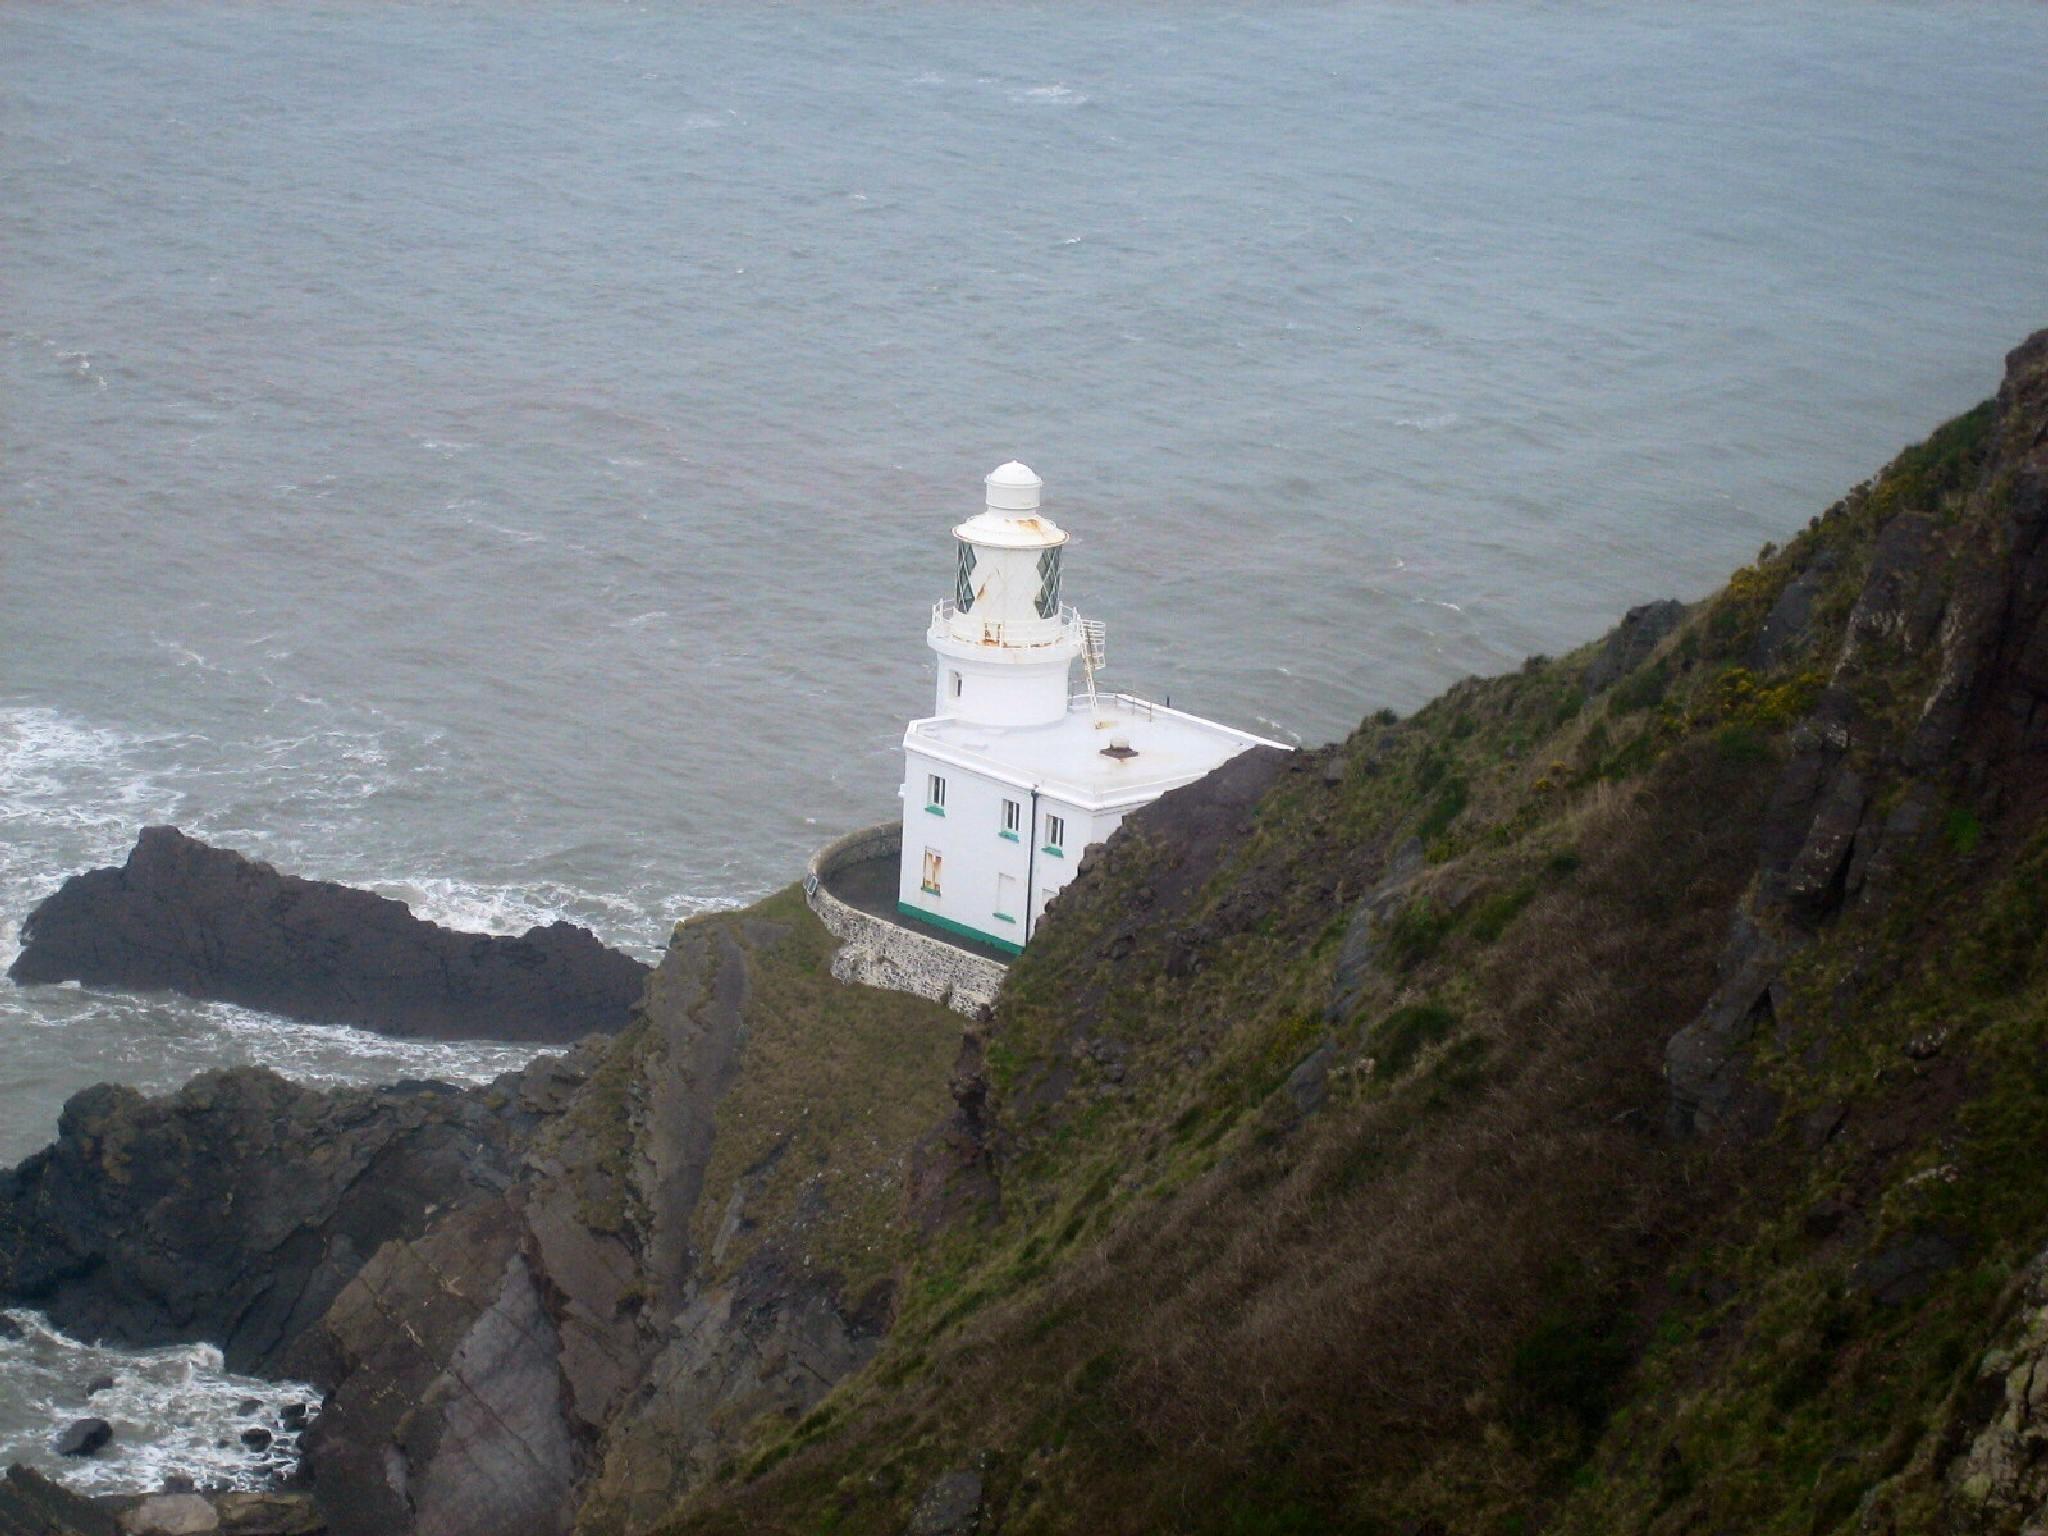 Lighthouse Hartland Point by ksoar1